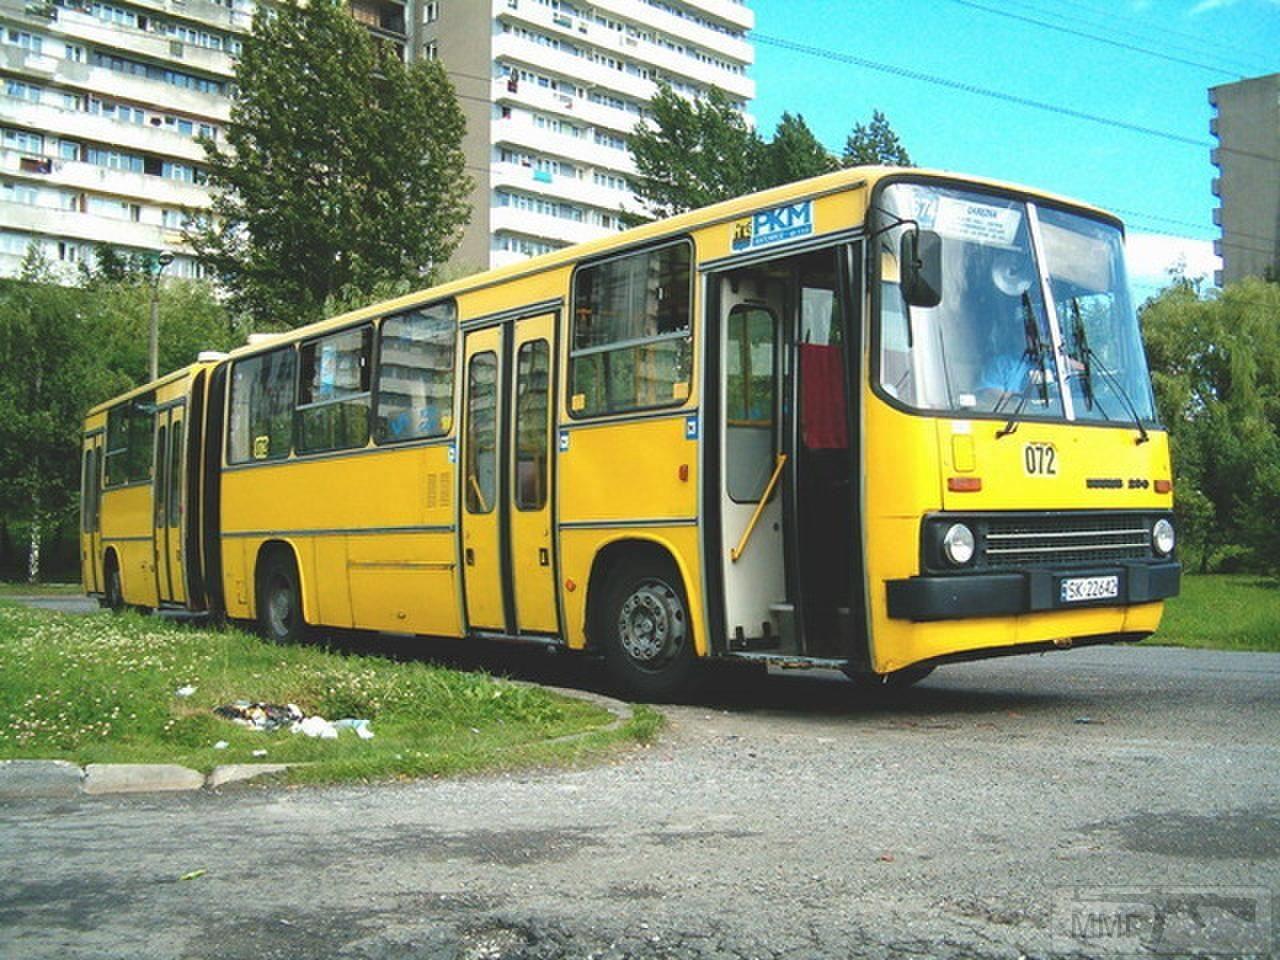 65292 - Икарусы